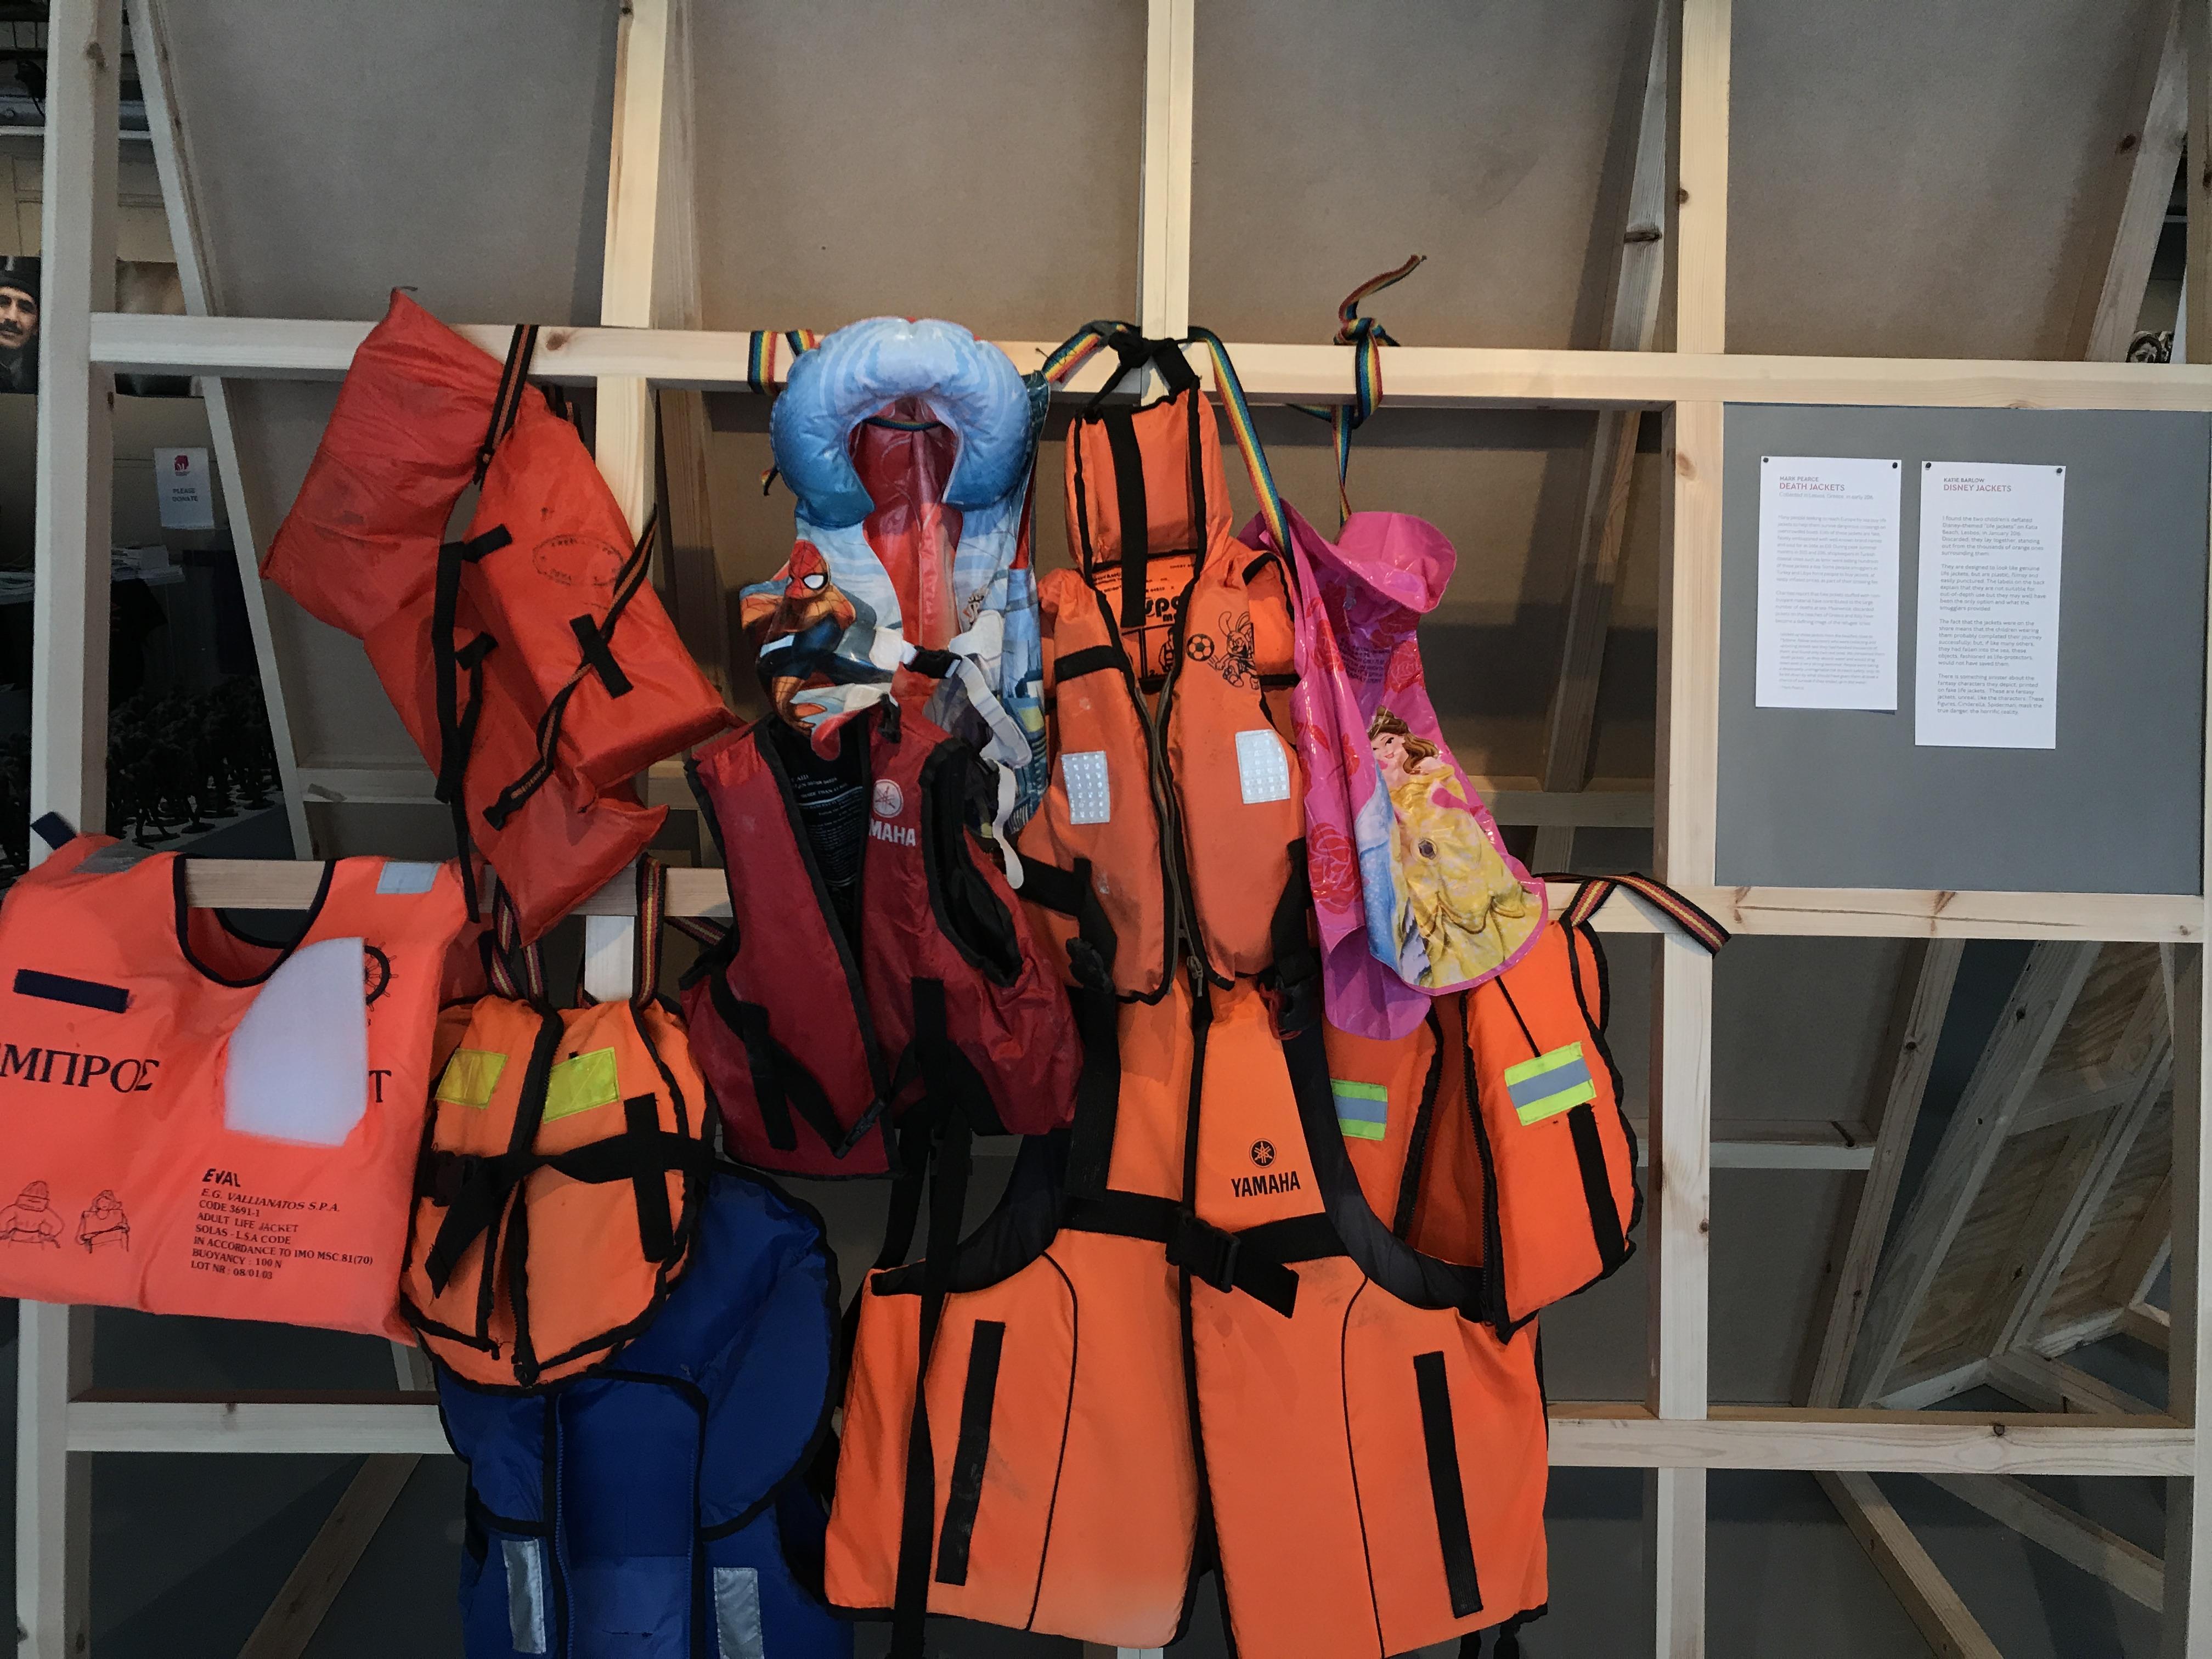 fake life jackets